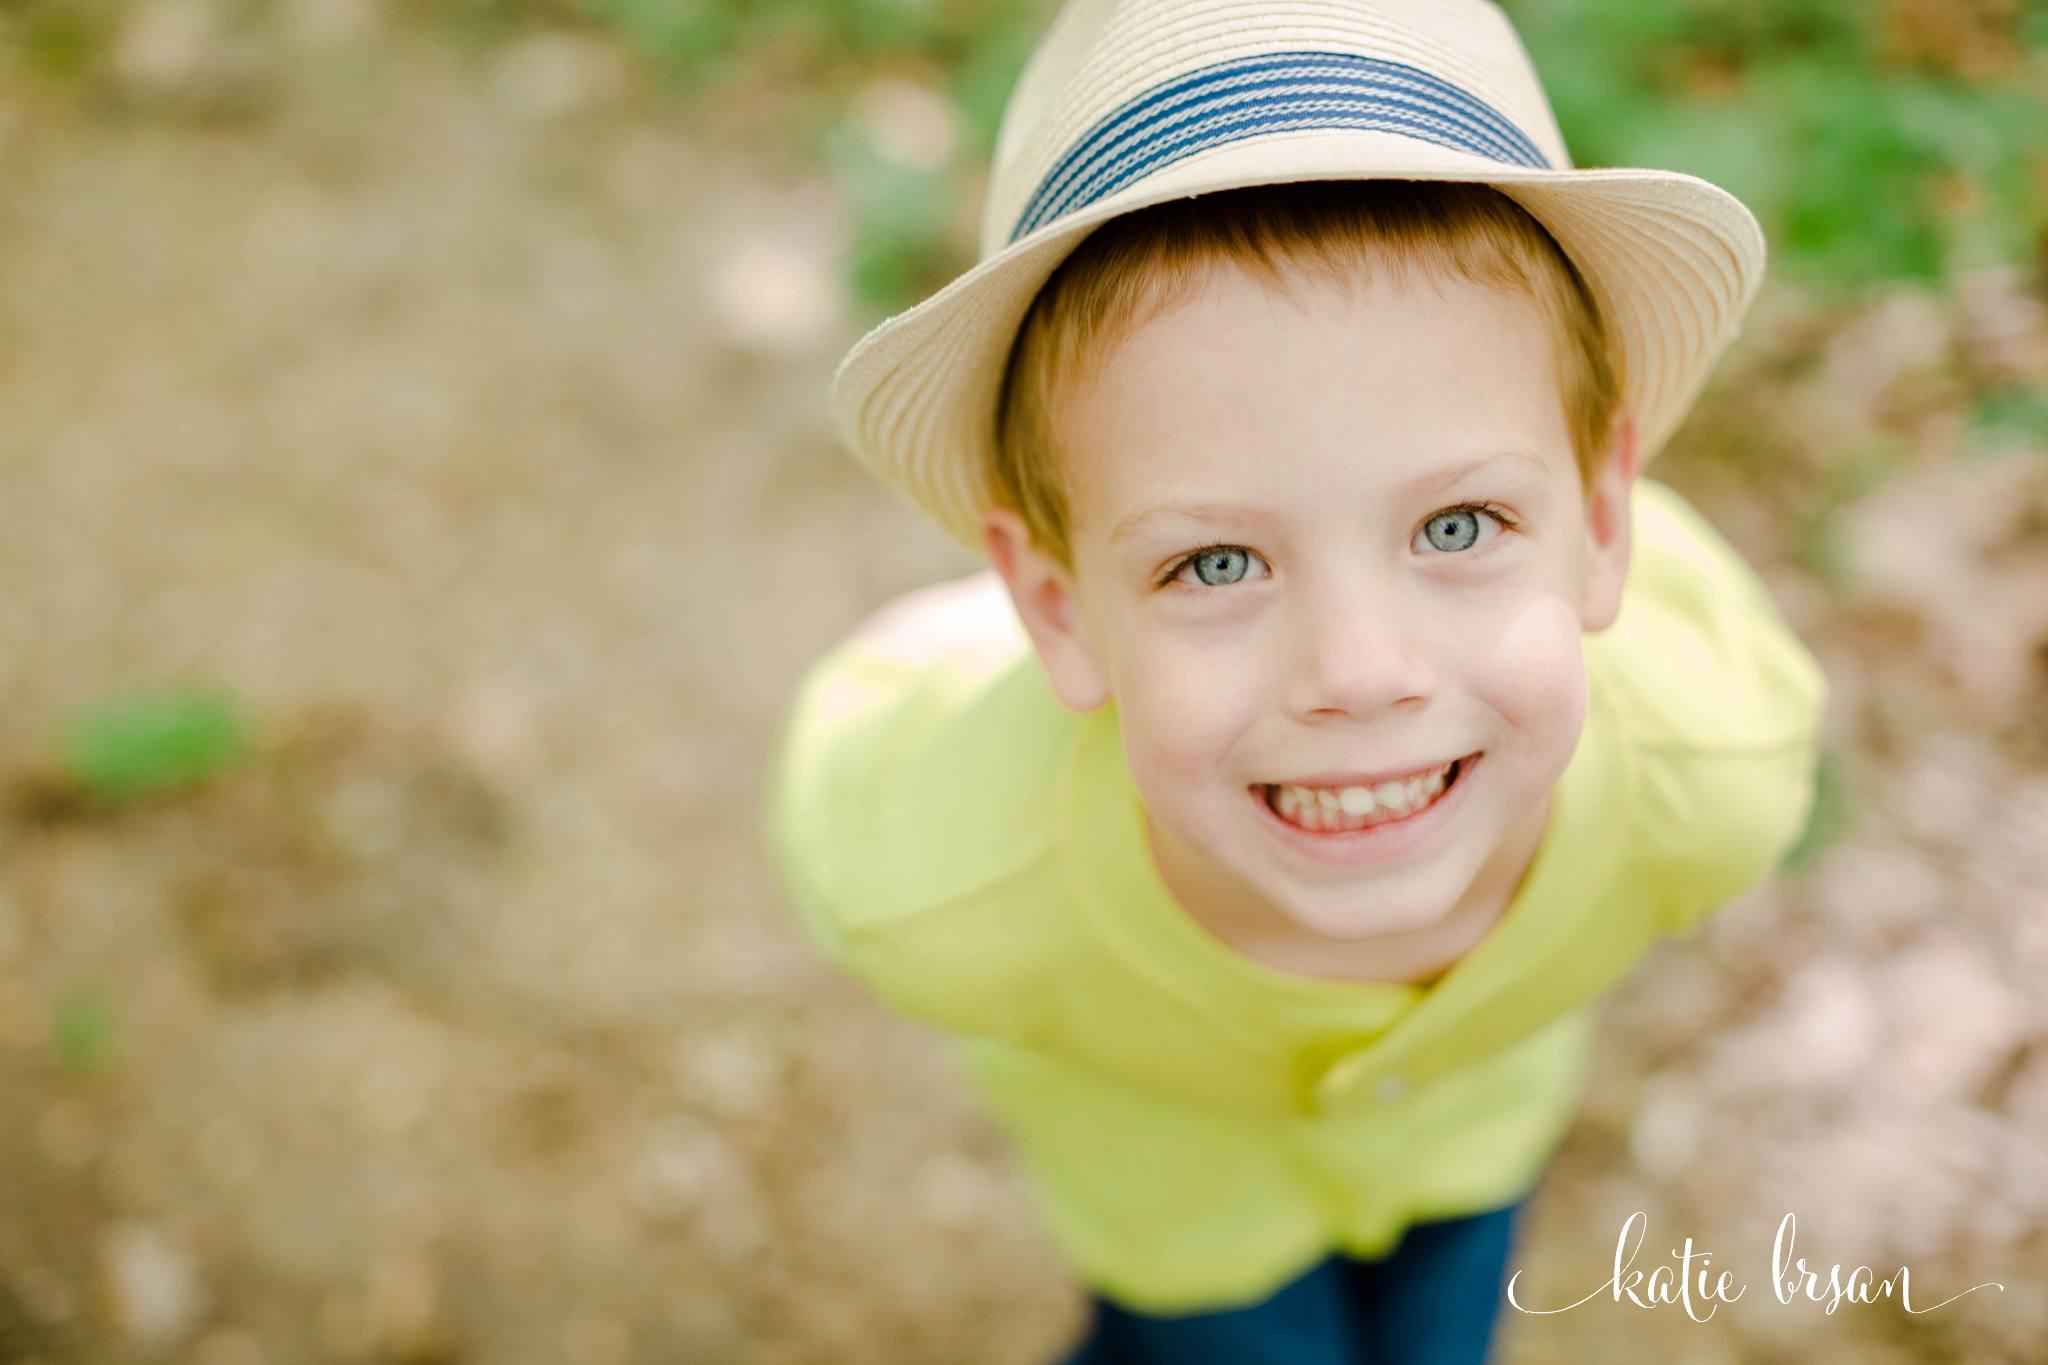 KatieBrsan-Shorewood-ChildPhotographer_0573.jpg